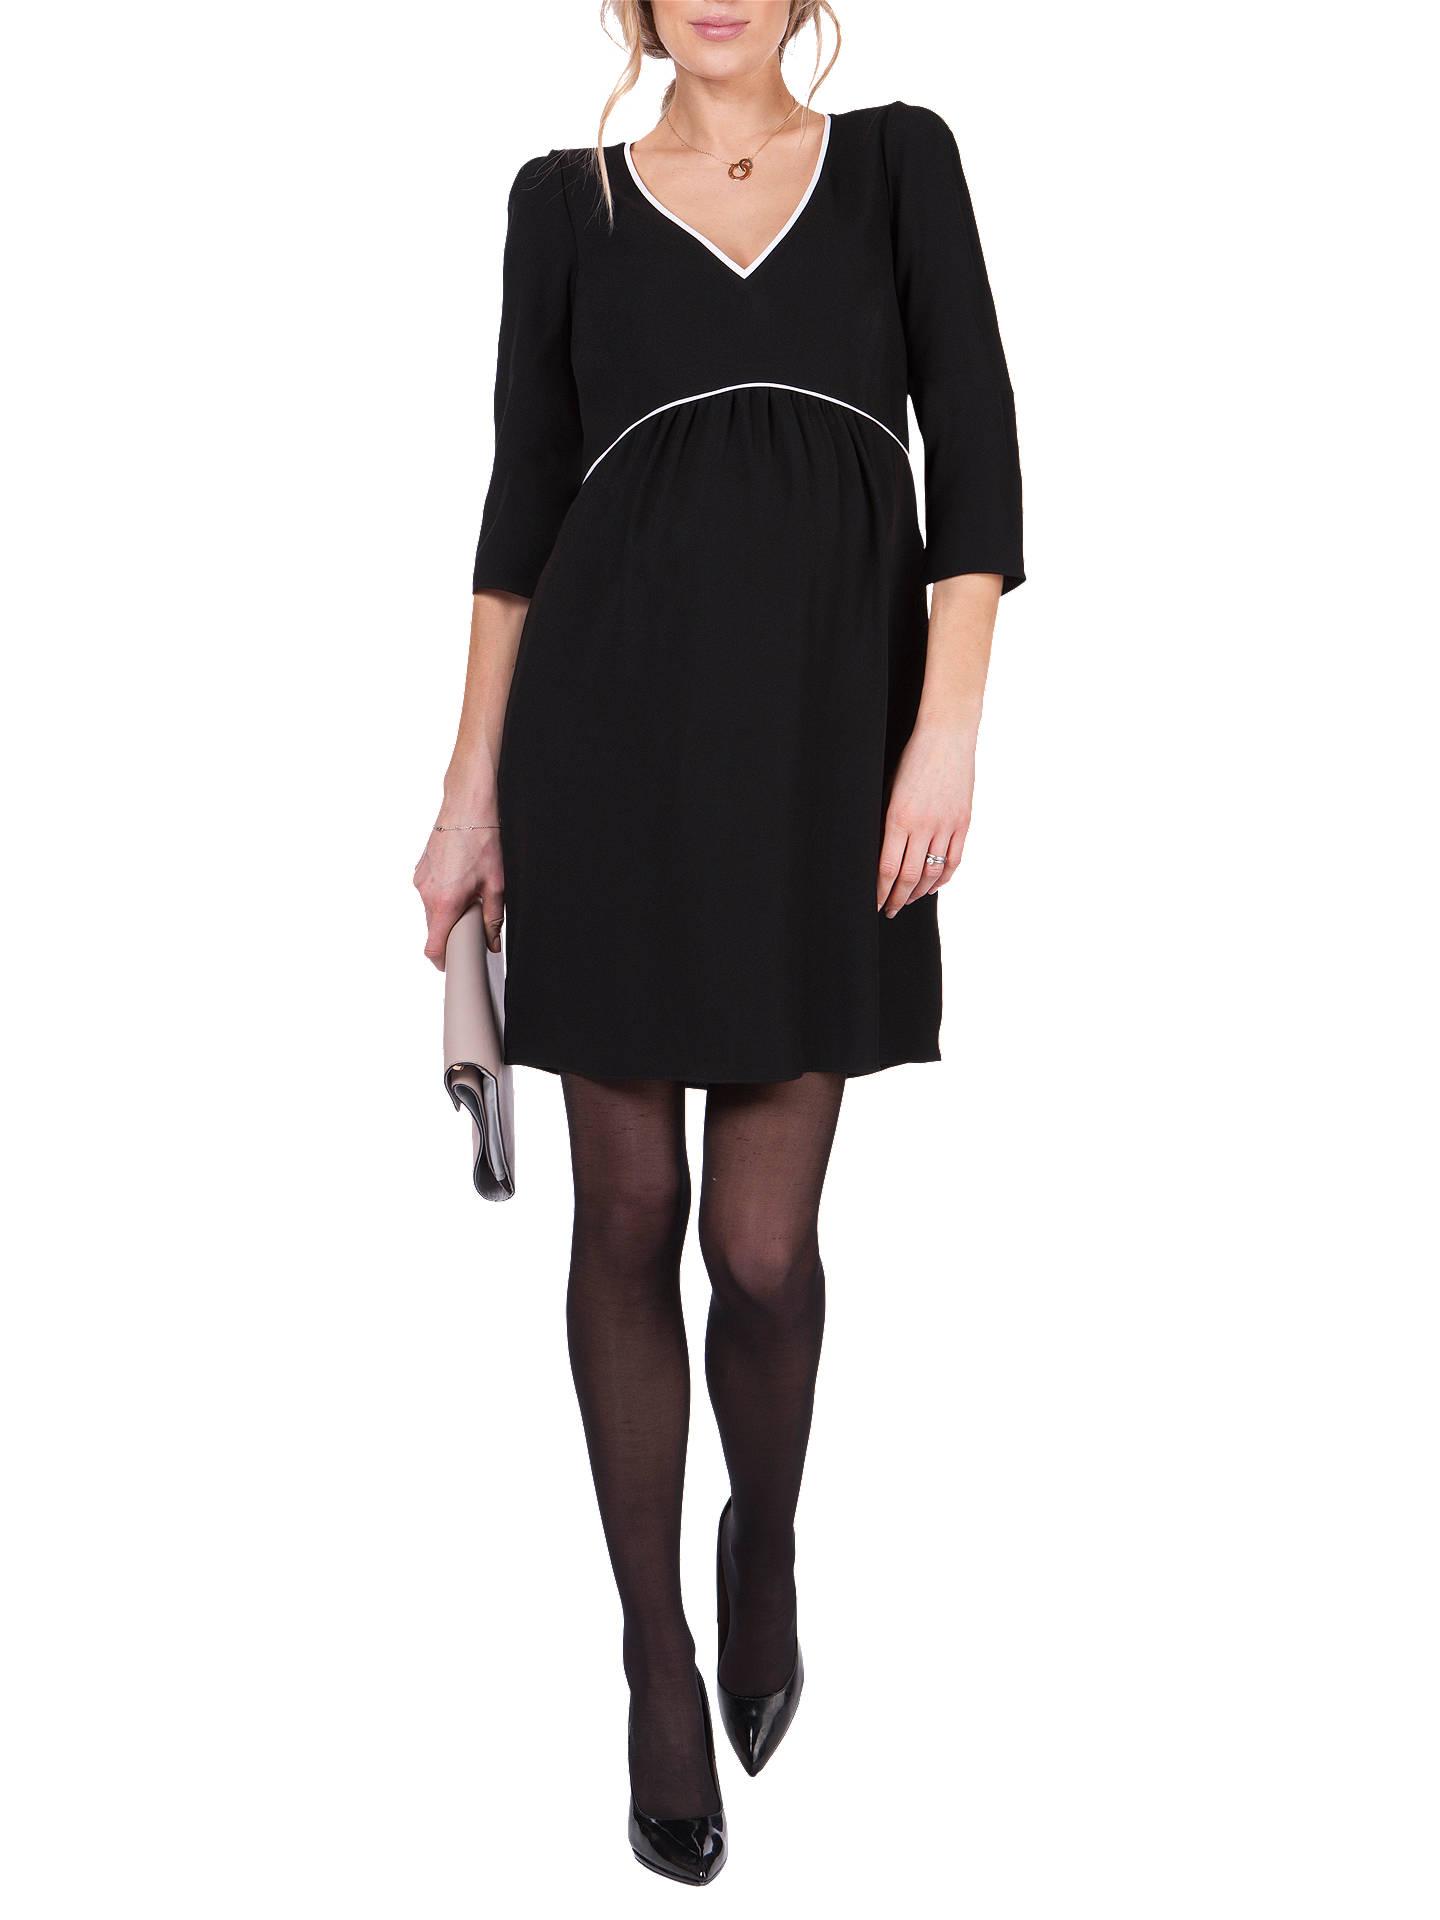 09879ba65b5dd ... Buy Séraphine Charlotte V Neck Maternity Dress, Black, 8 Online at  johnlewis.com